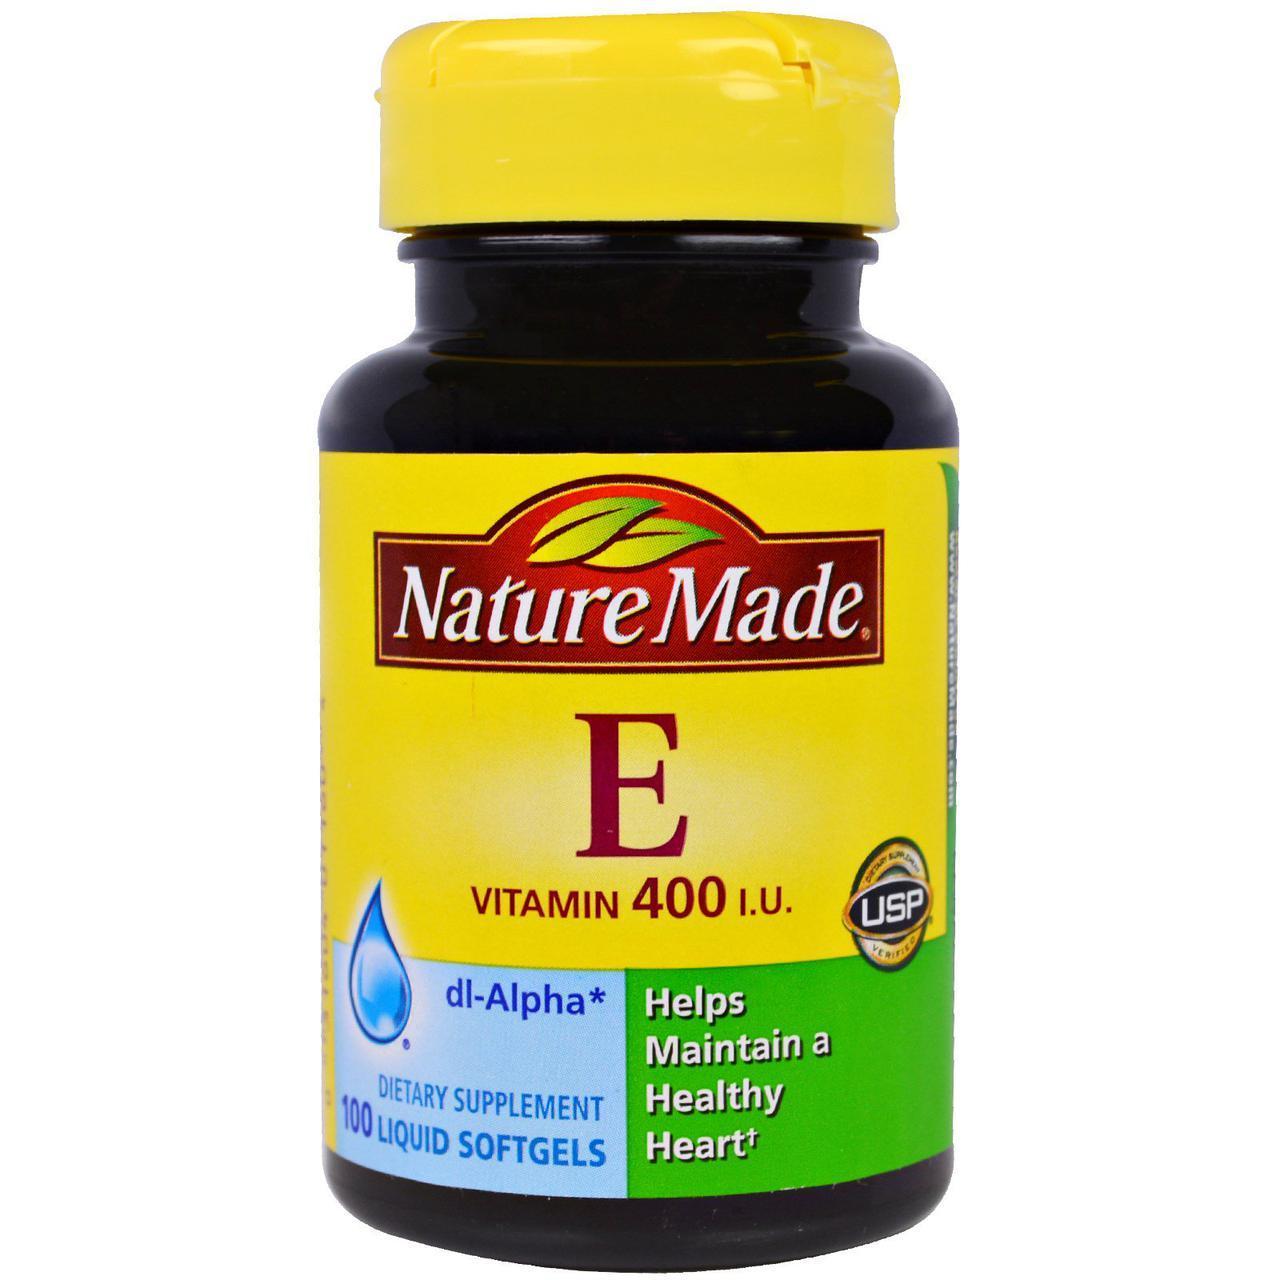 Nature Made, Vitamin E, 400IU, dl-Alpha, Витамин Е 100 Liquid Softgels